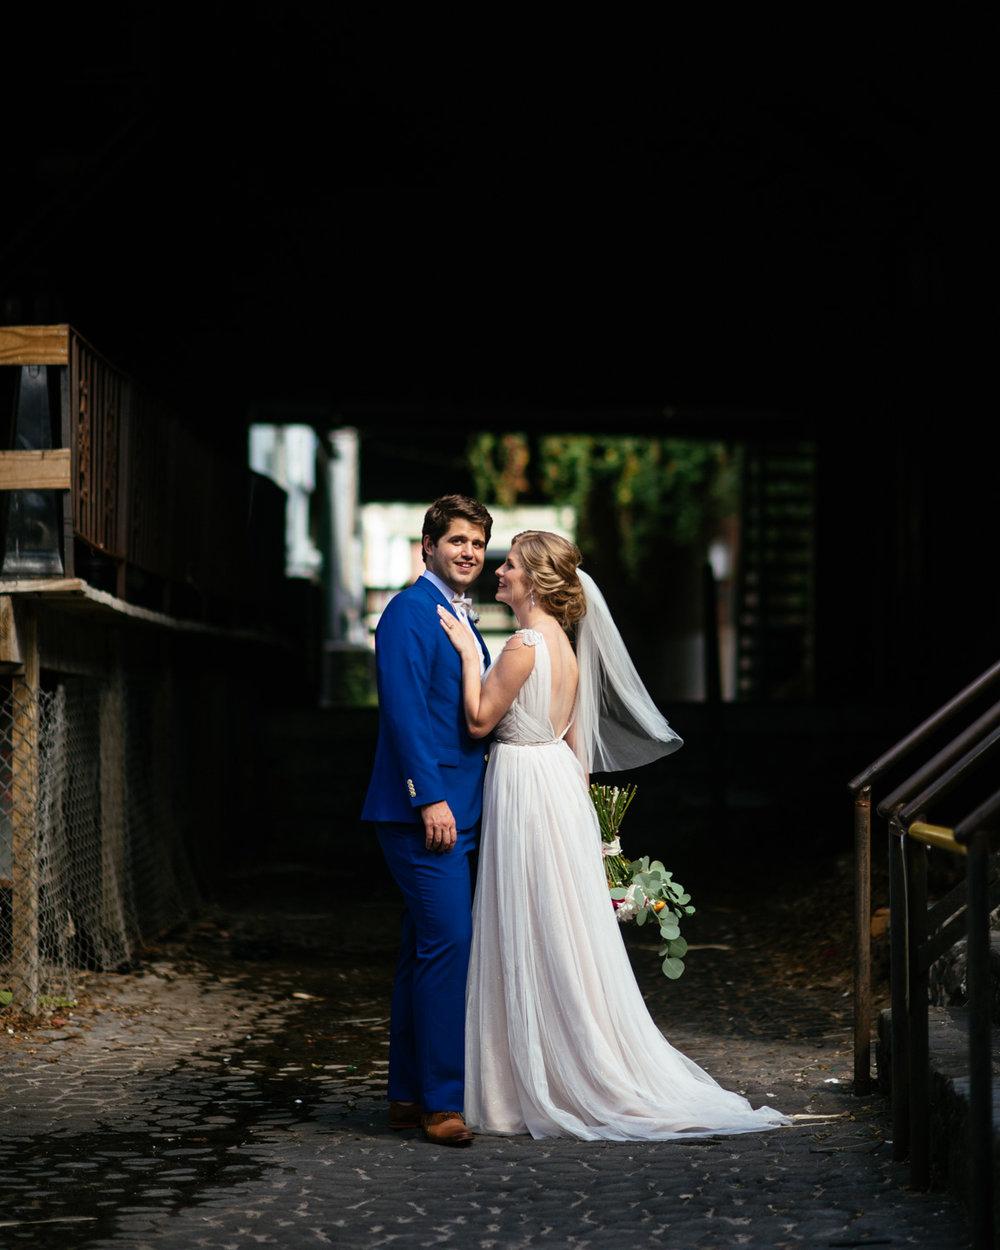 melissa-andrew-soho-south-wedding-lafayette-square-wedding-historic-savannah-wedding-ivory-and-beau-bridal-boutique-savannah-florist-savannah-wedding-planner-southern-wedding-destination-wedding-34.jpg